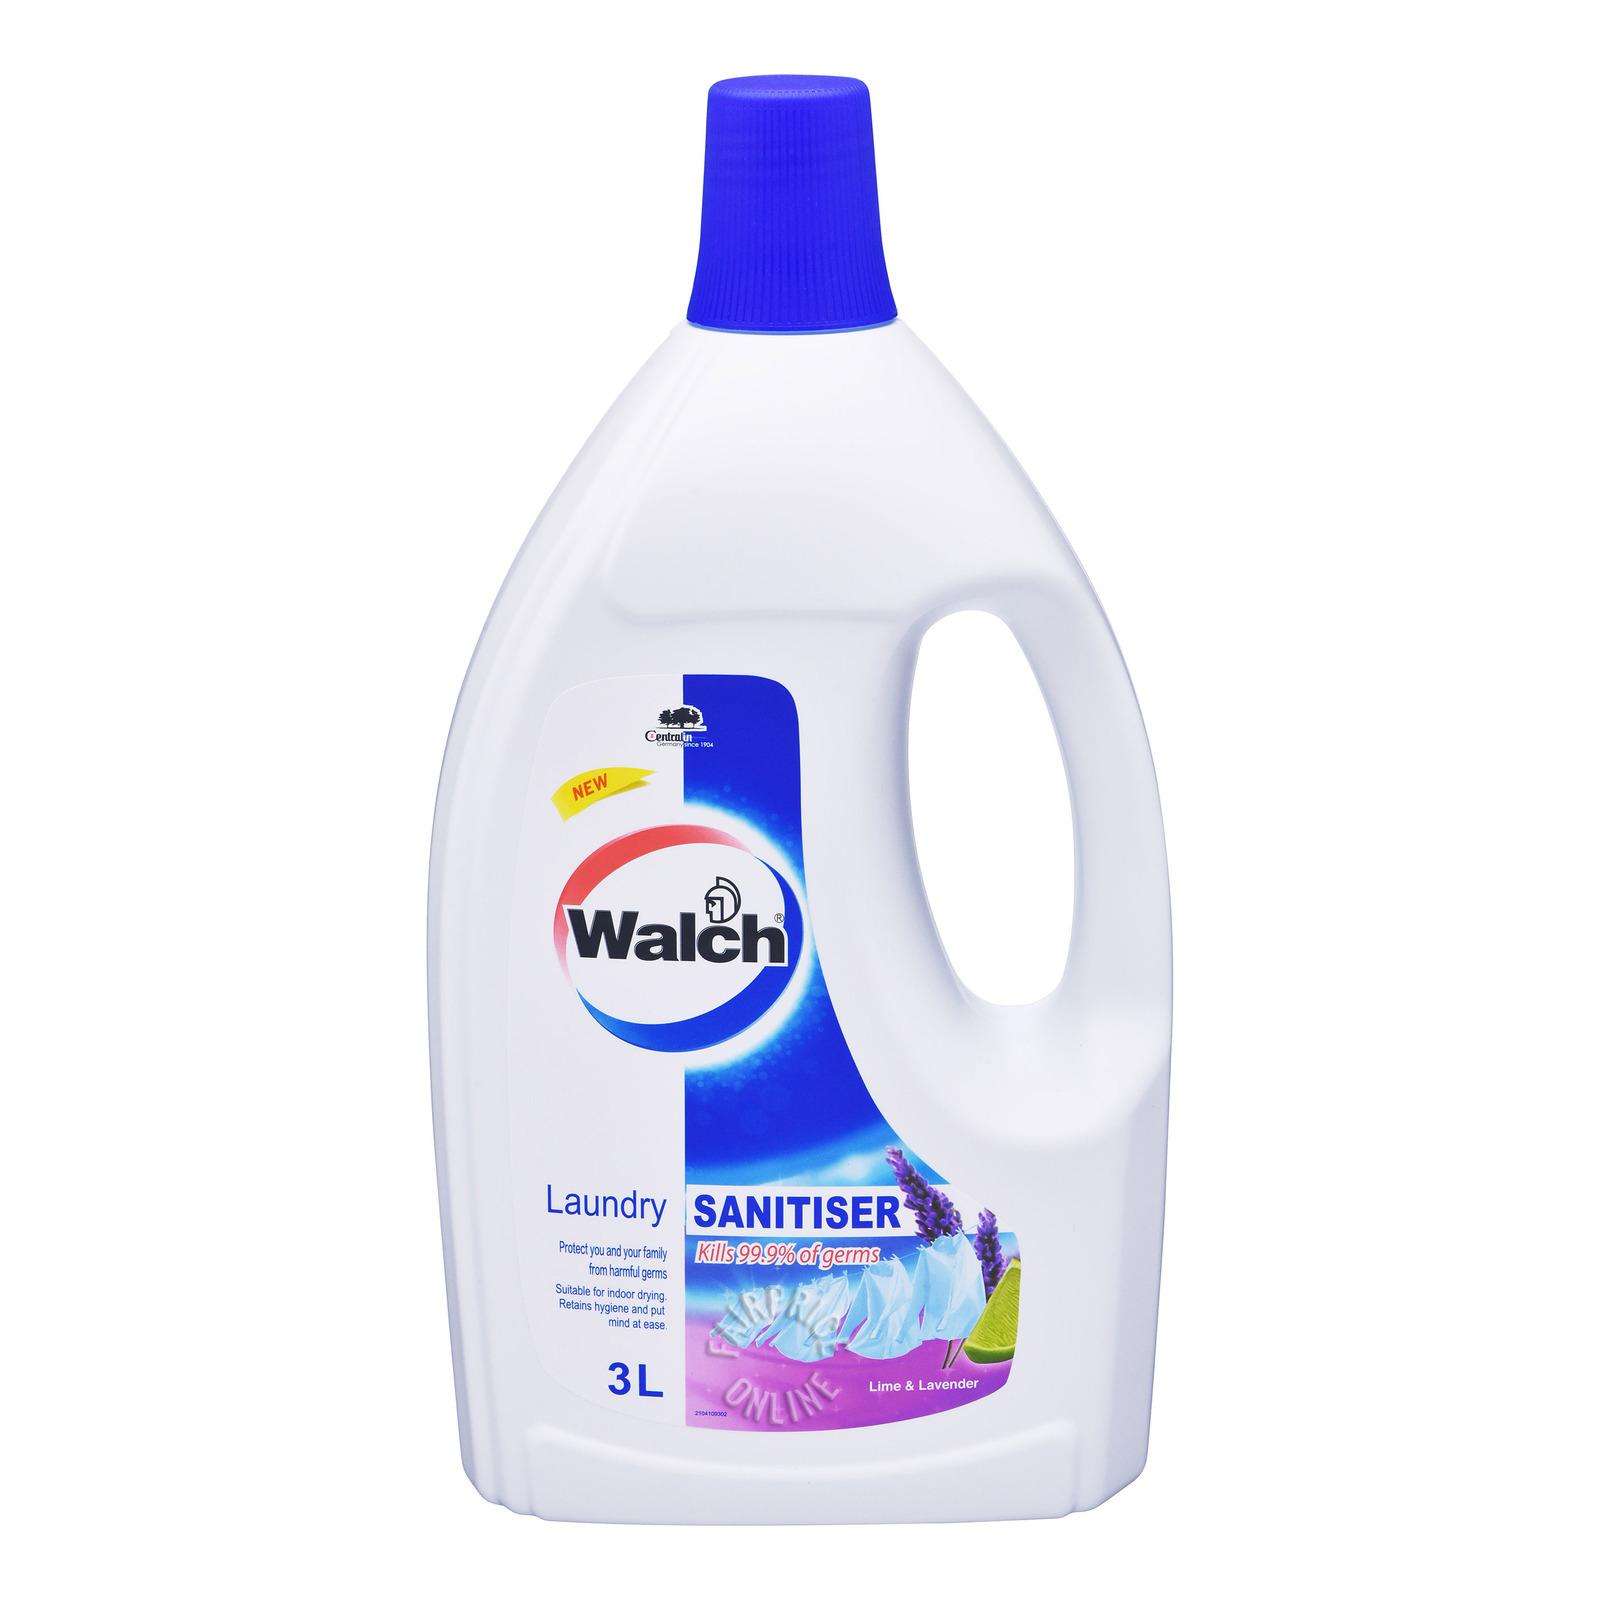 Walch Laundry Sanitizer - Lavender